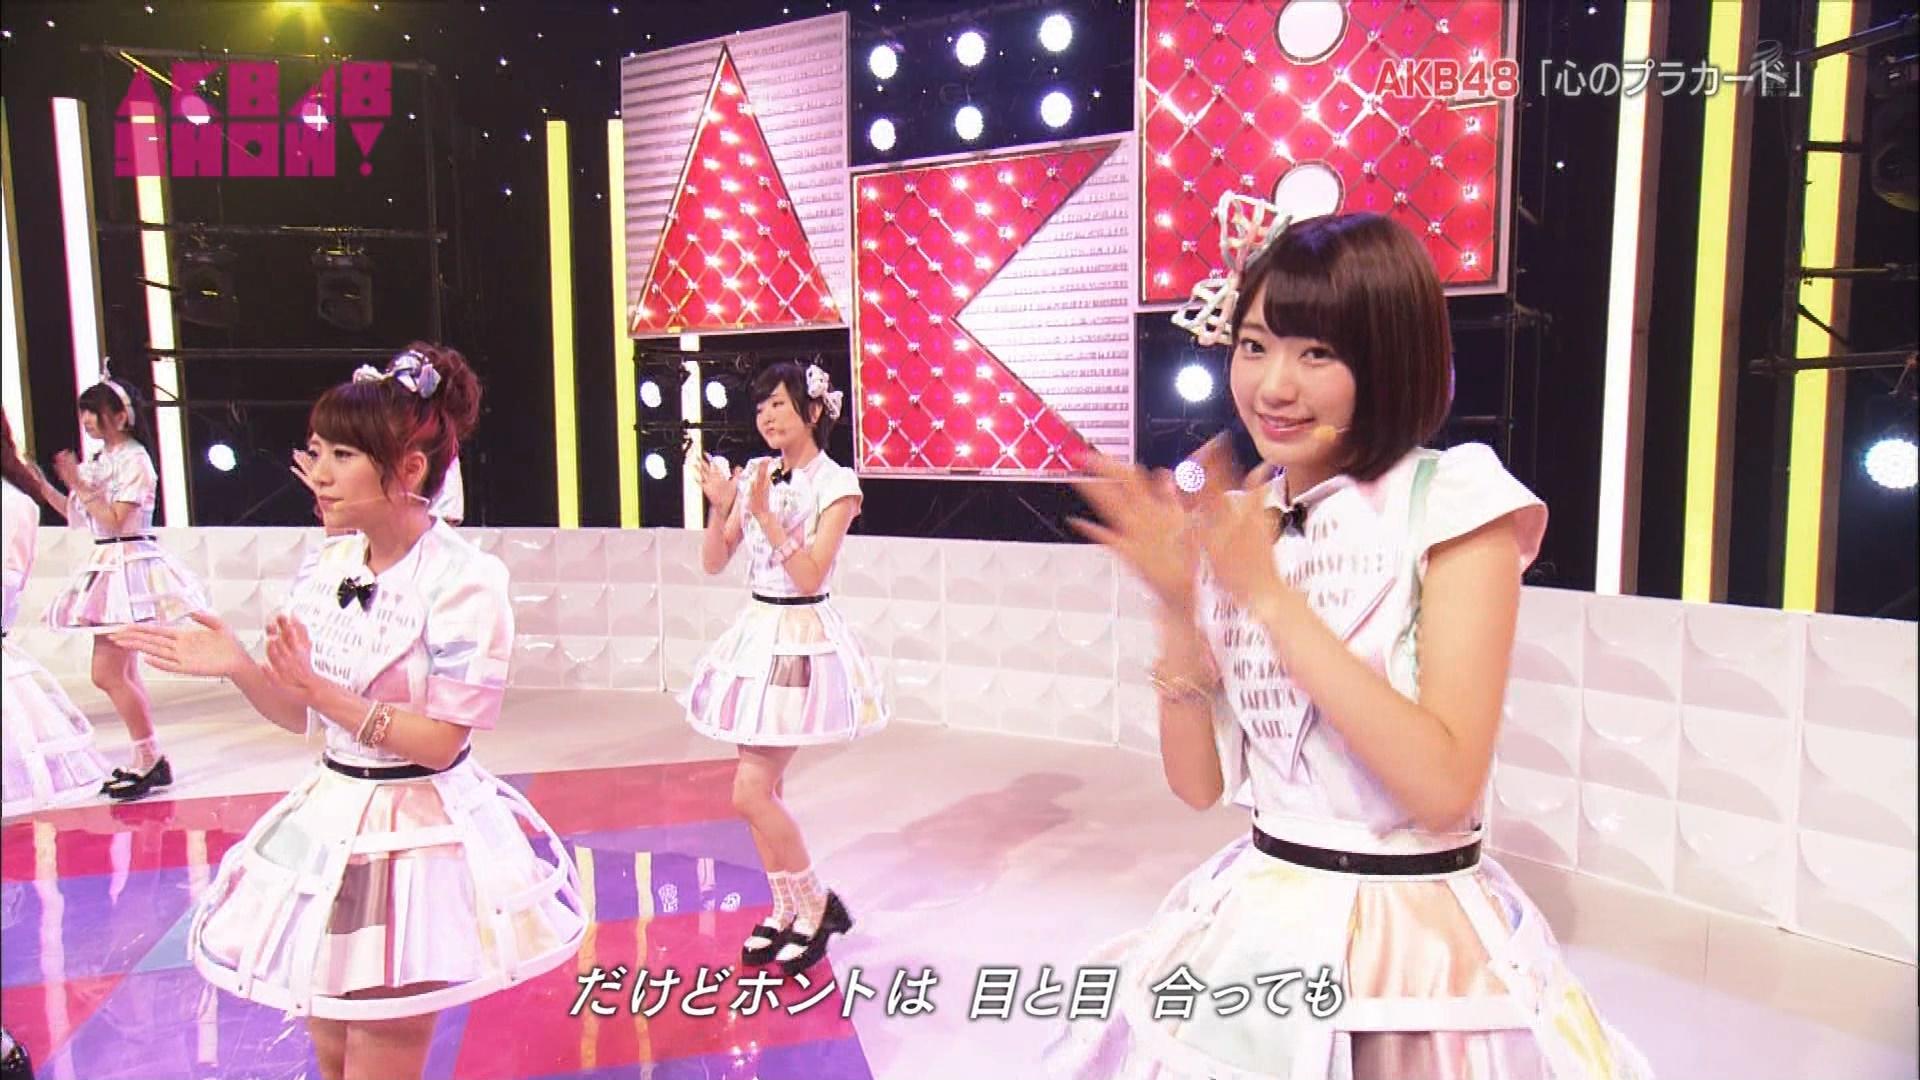 AKB48SHOW 心のプラカード 宮脇咲良 20140830 (14)